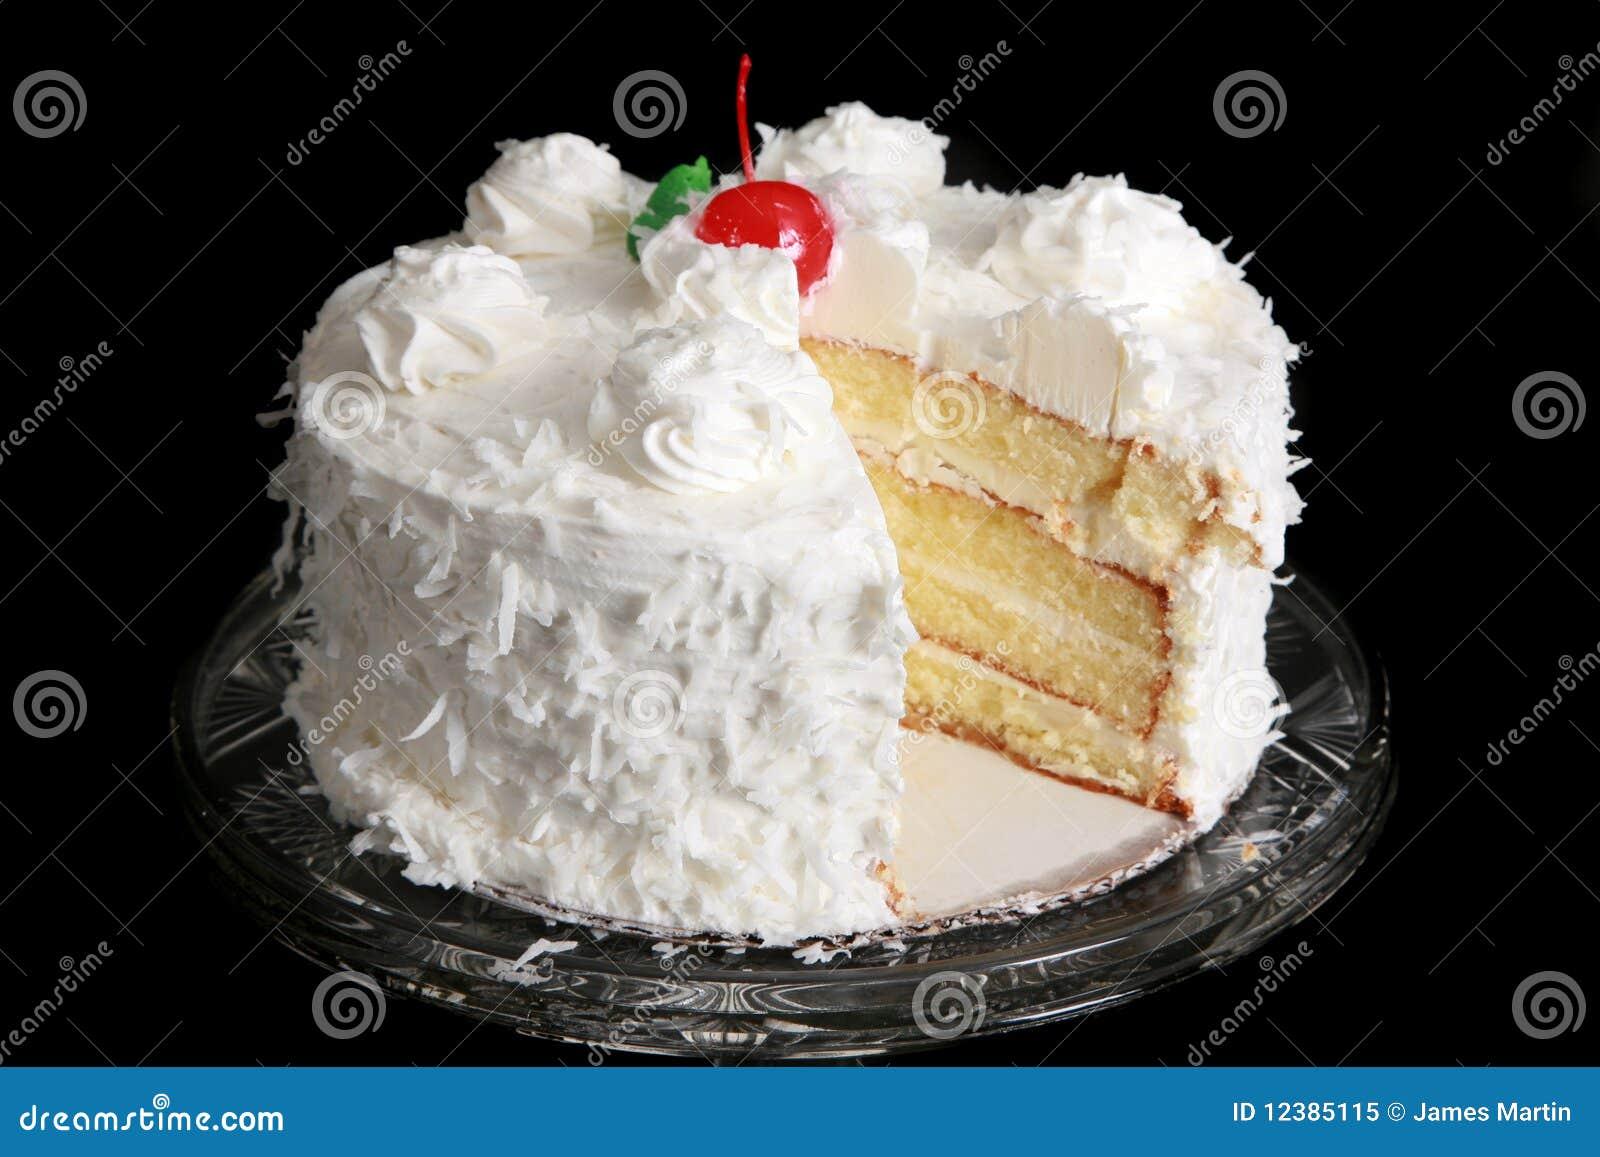 Coconut Cake Stock Image Image Of Swirls Frosting